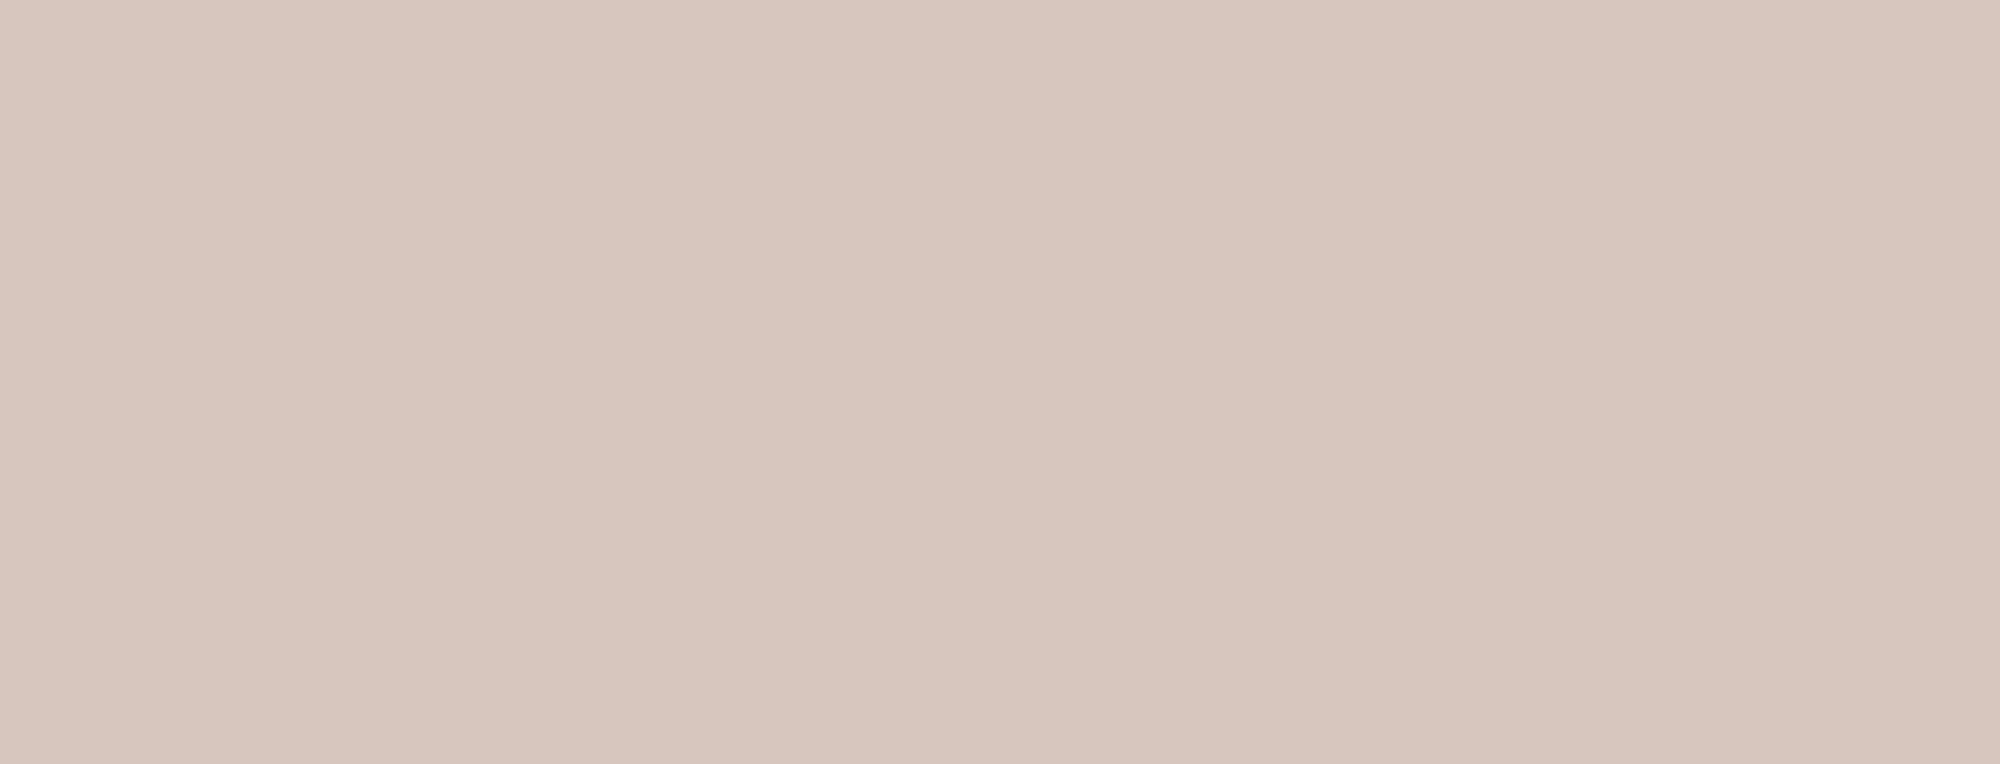 jcb danceworks,jcb danceworks competitive,jcb danceworks comptetitive dance,join competitive dance,dance competitions,competitive dancer,competitive dance routines,hip hop,lyrical,ballet,contemporary,tap,acro,jazz,competitive dance auditions,competitive dance auditions richmond hill,full time competitive dance,part time competitive dance,competitive dance team,competitive dance team richmond hill,competitive dance team vaughan,competitive dance,competitive dance in richmond hill,competitive dance in vaughan,competitive dance in maple,competitive dance near me,competitive dance in thornhill,competitive dance program,competitive dance programs,